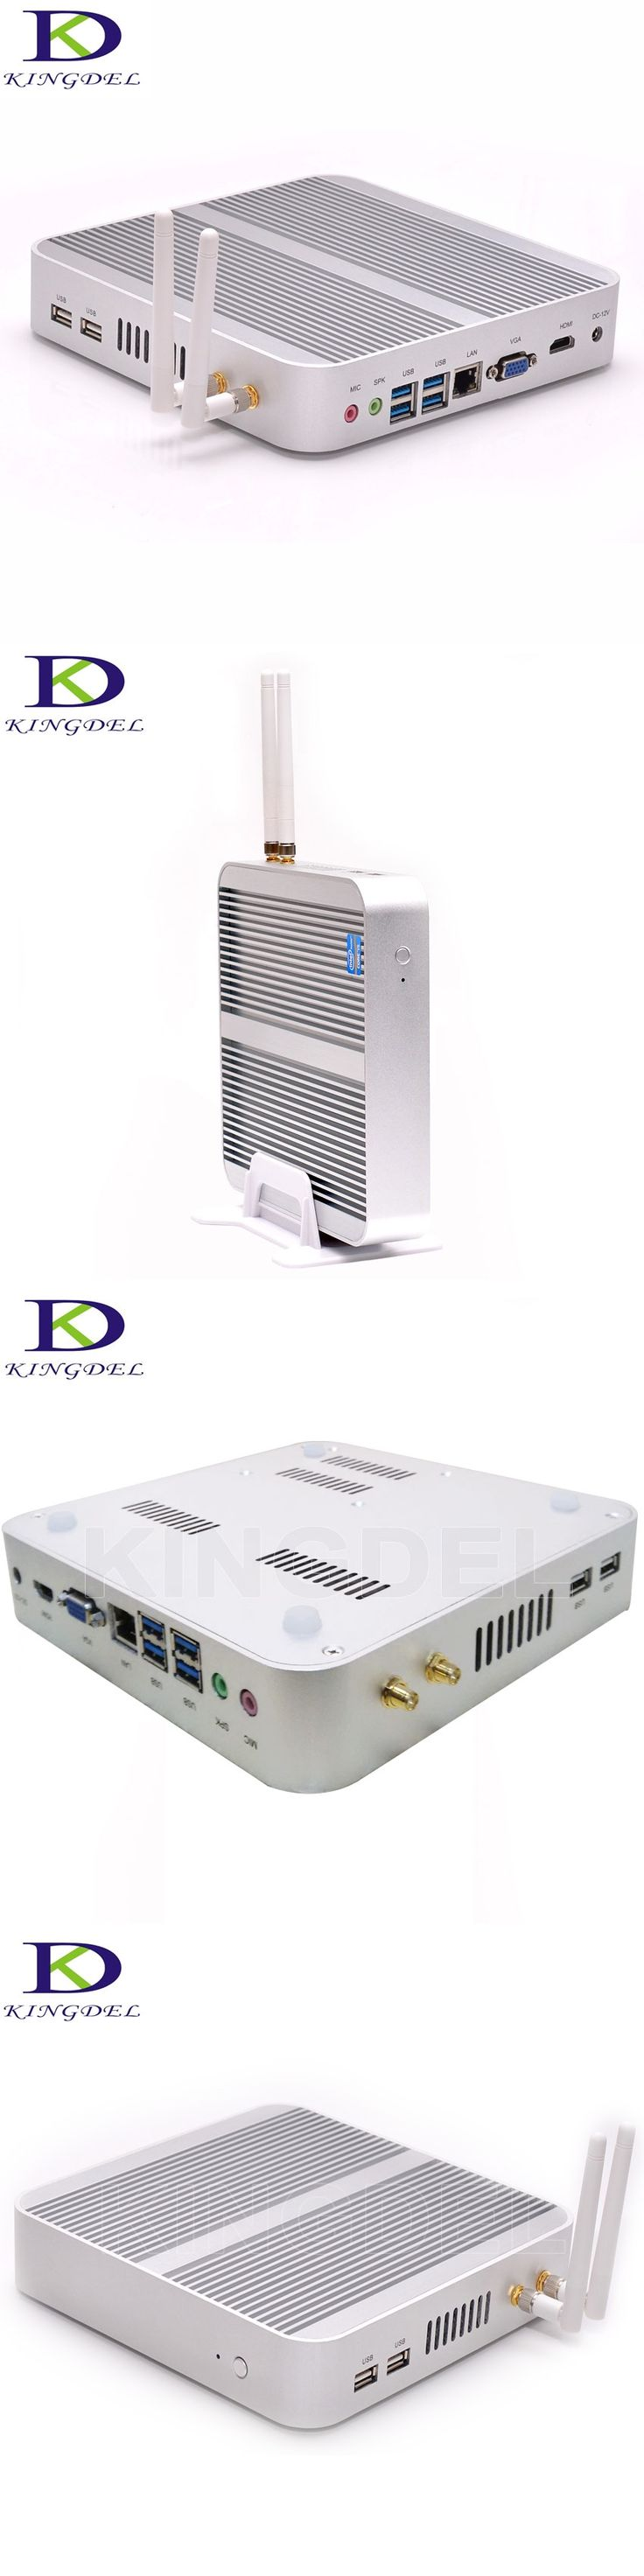 3-Years-Warranty Fanless Industrial Mini PC i5 4200U Dual Core HTPC TV Box VGA HDMI Intel HD Graphics 4K 1000M LAN Mini Computer